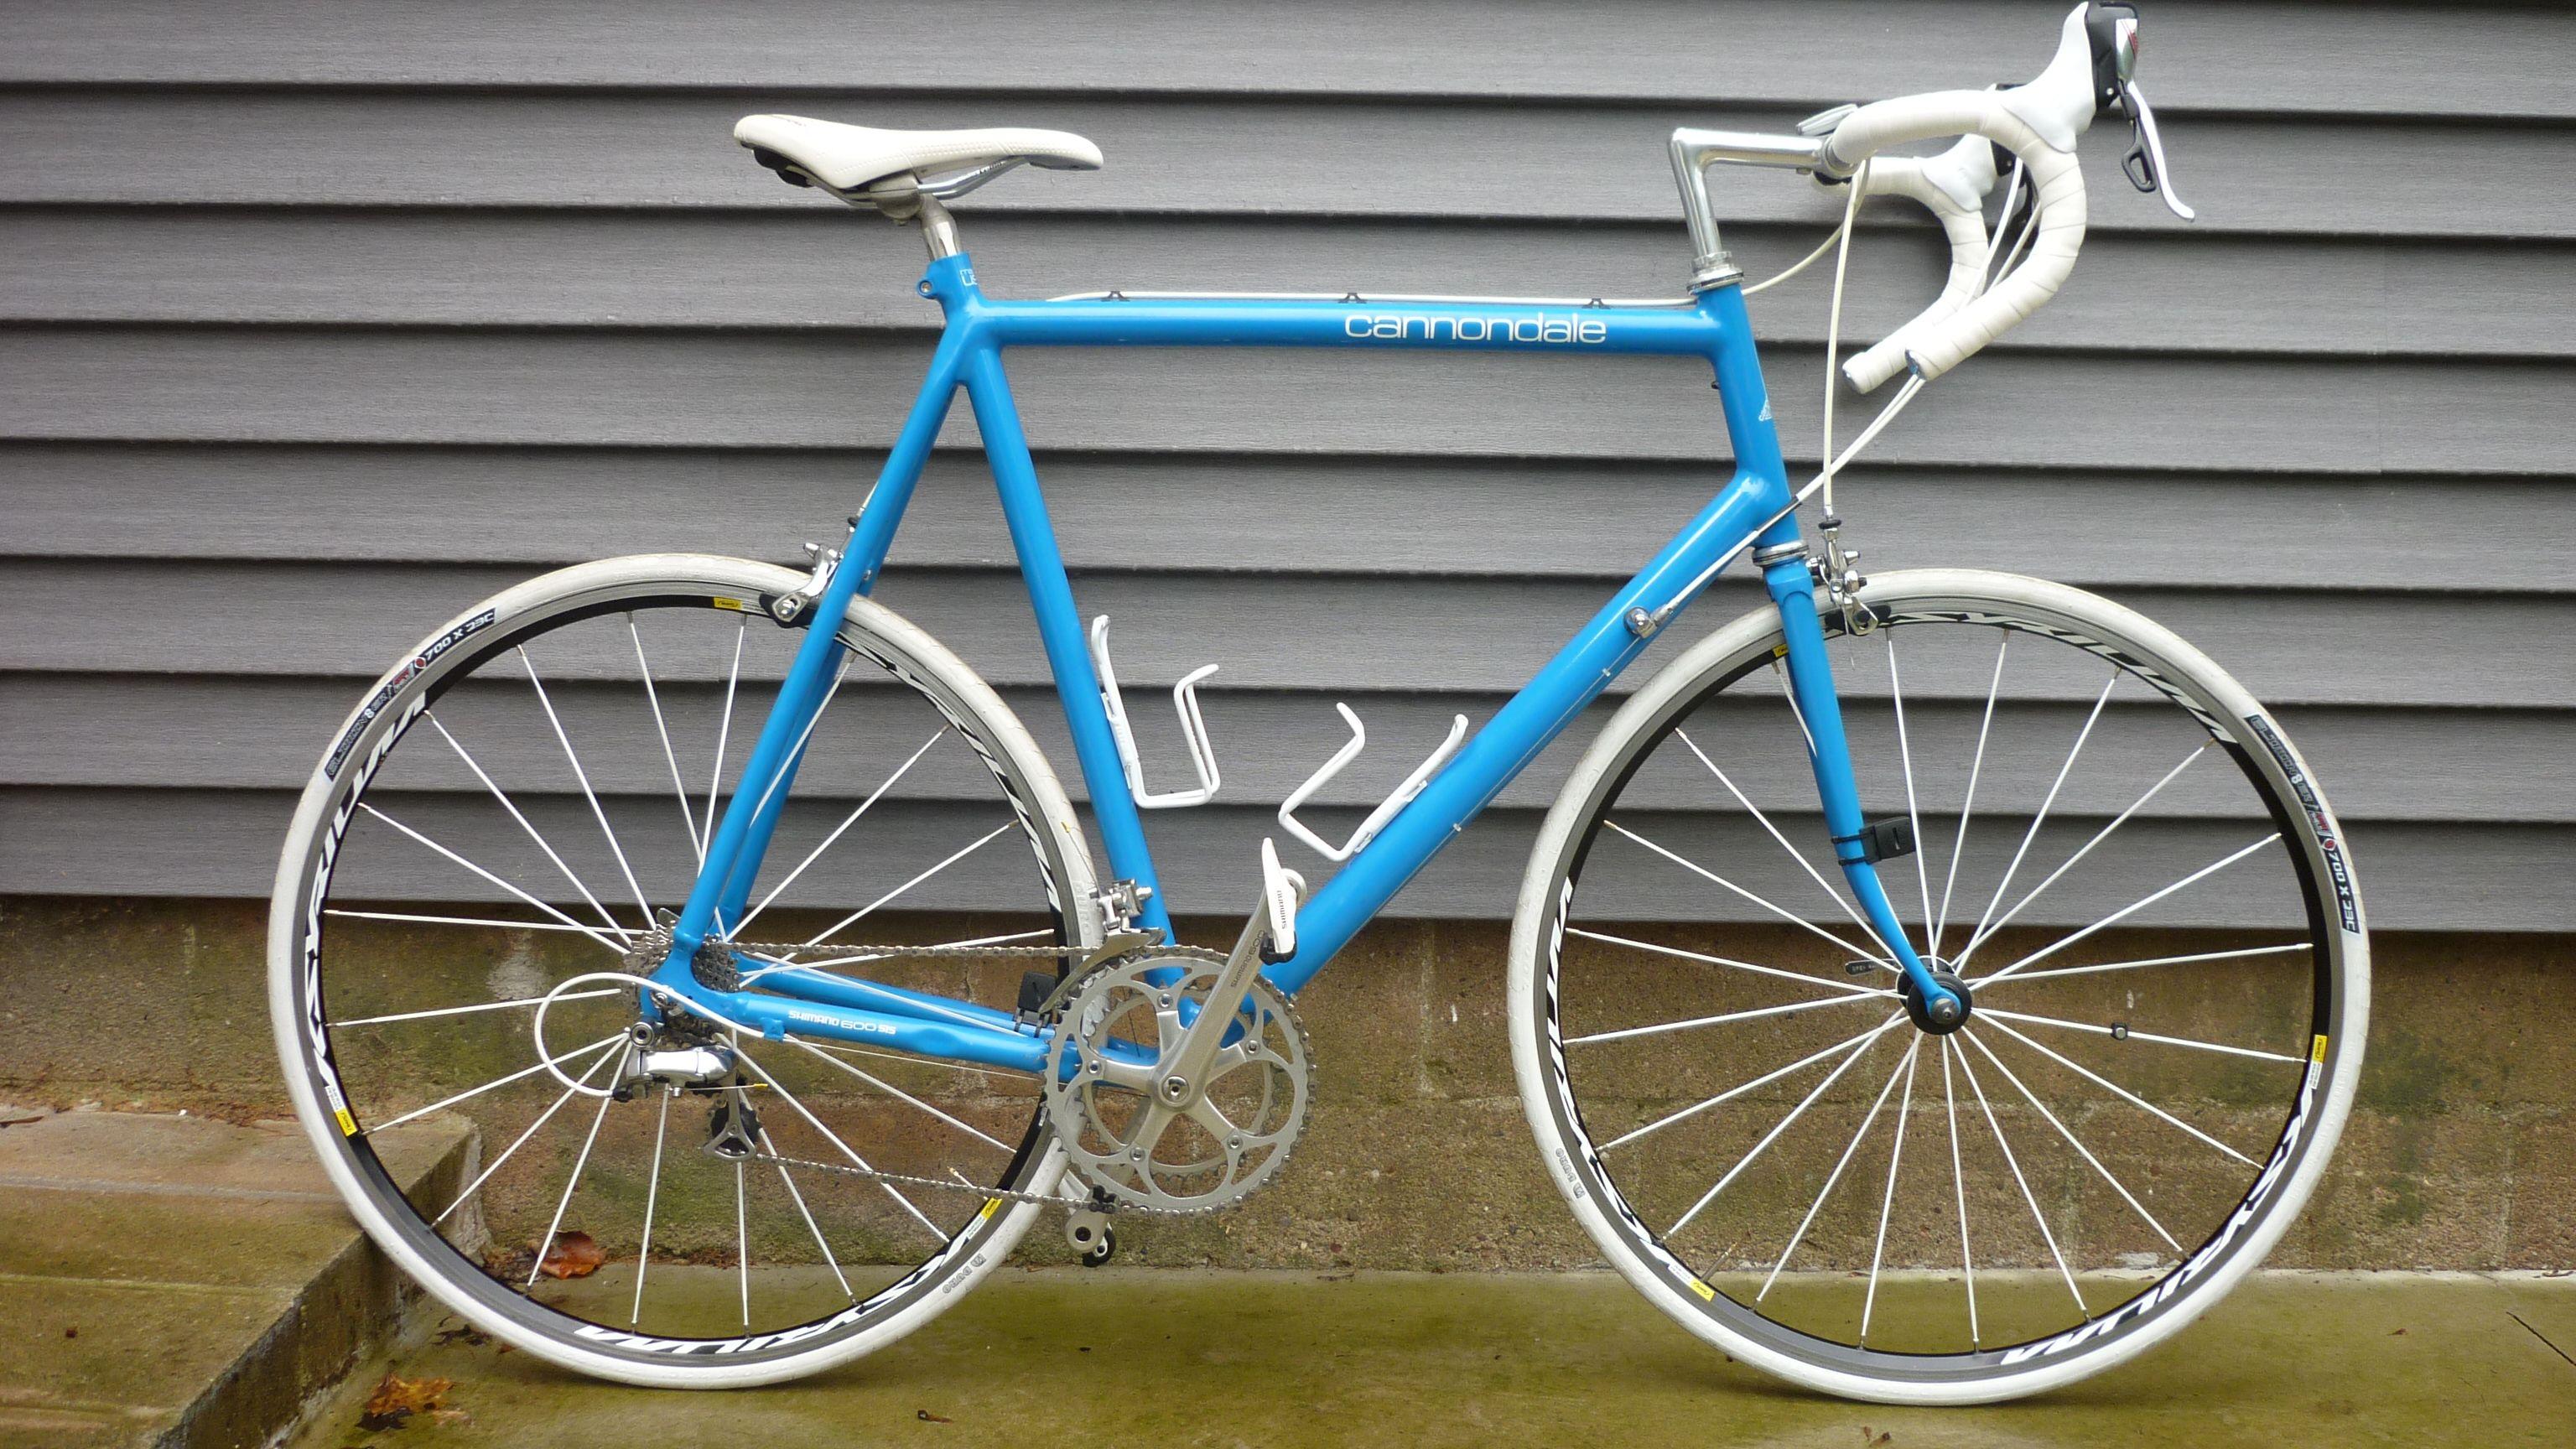 Sr 600 Vintage Cannondale Cannondale Vintage Bicycle